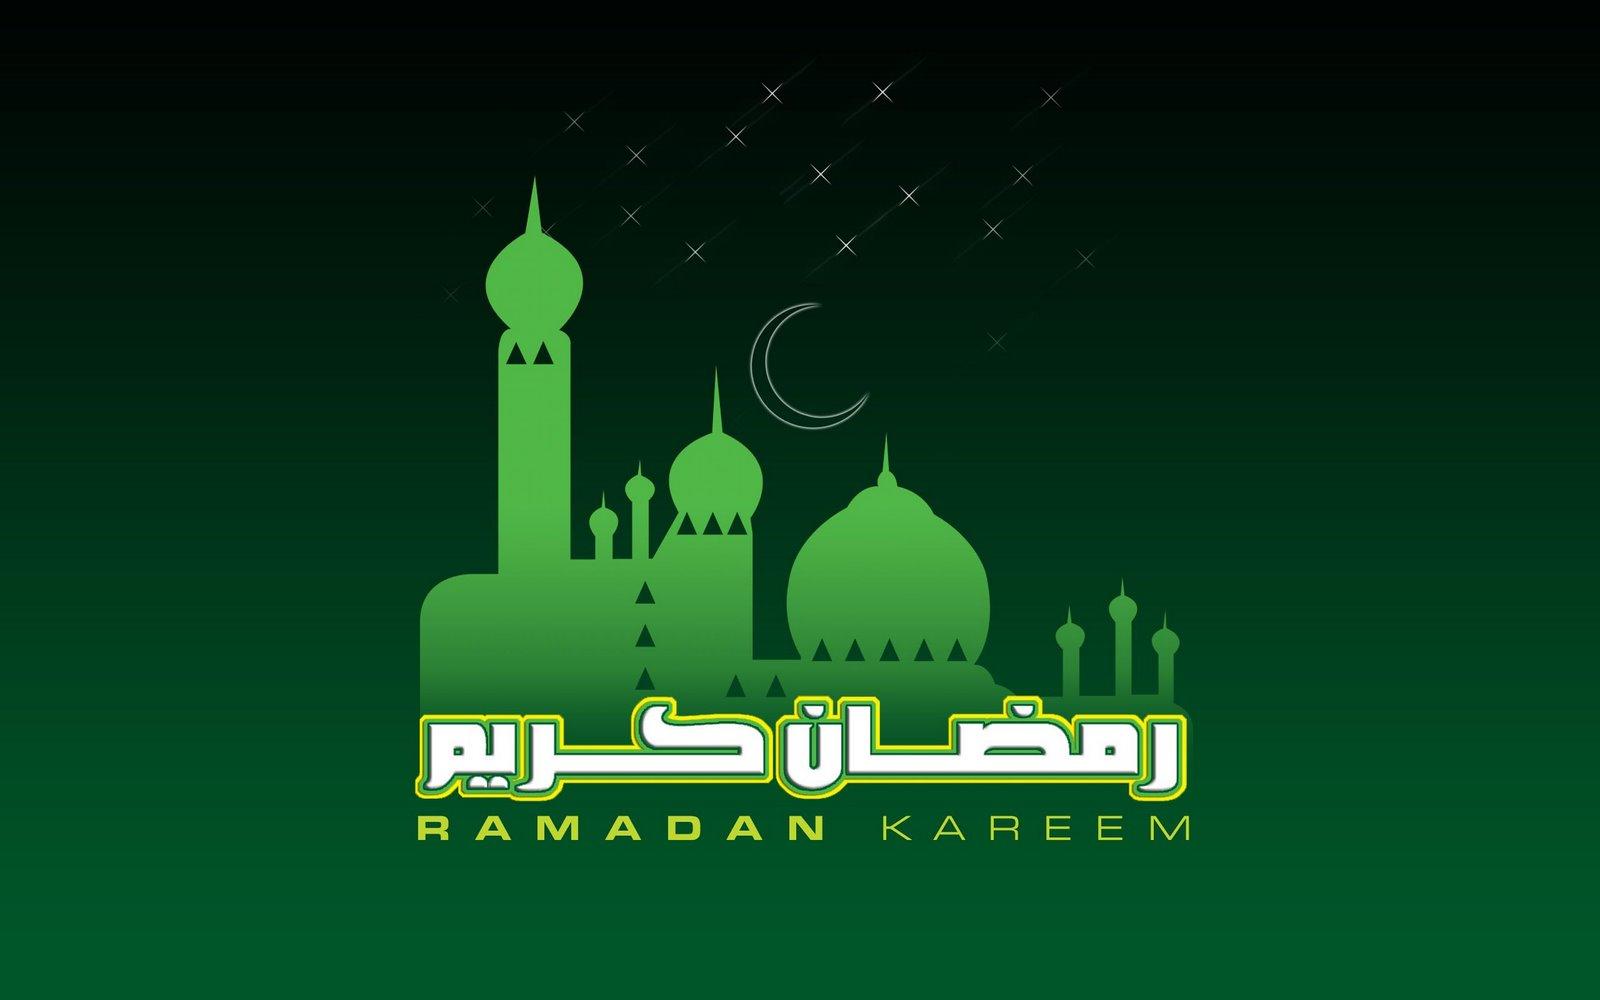 Cute Babies Wallpapers Download Free Tiptop 3d Amp Hd Wallpapers Collection Ramadan Mubarak